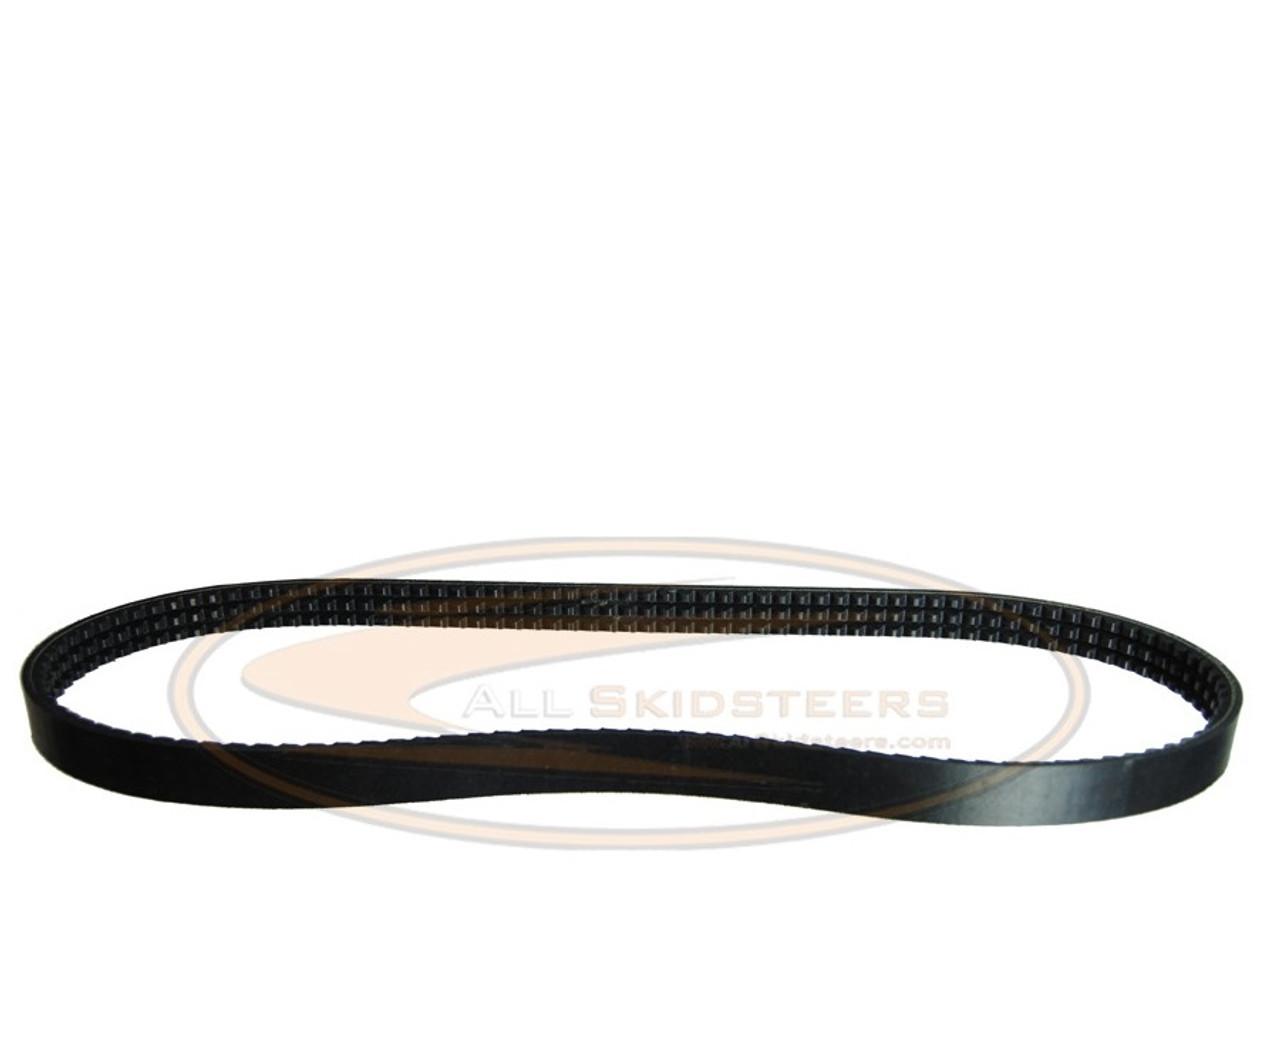 Drive Belt for Bobcat® Skid Steer   Replaces OEM # 6736775